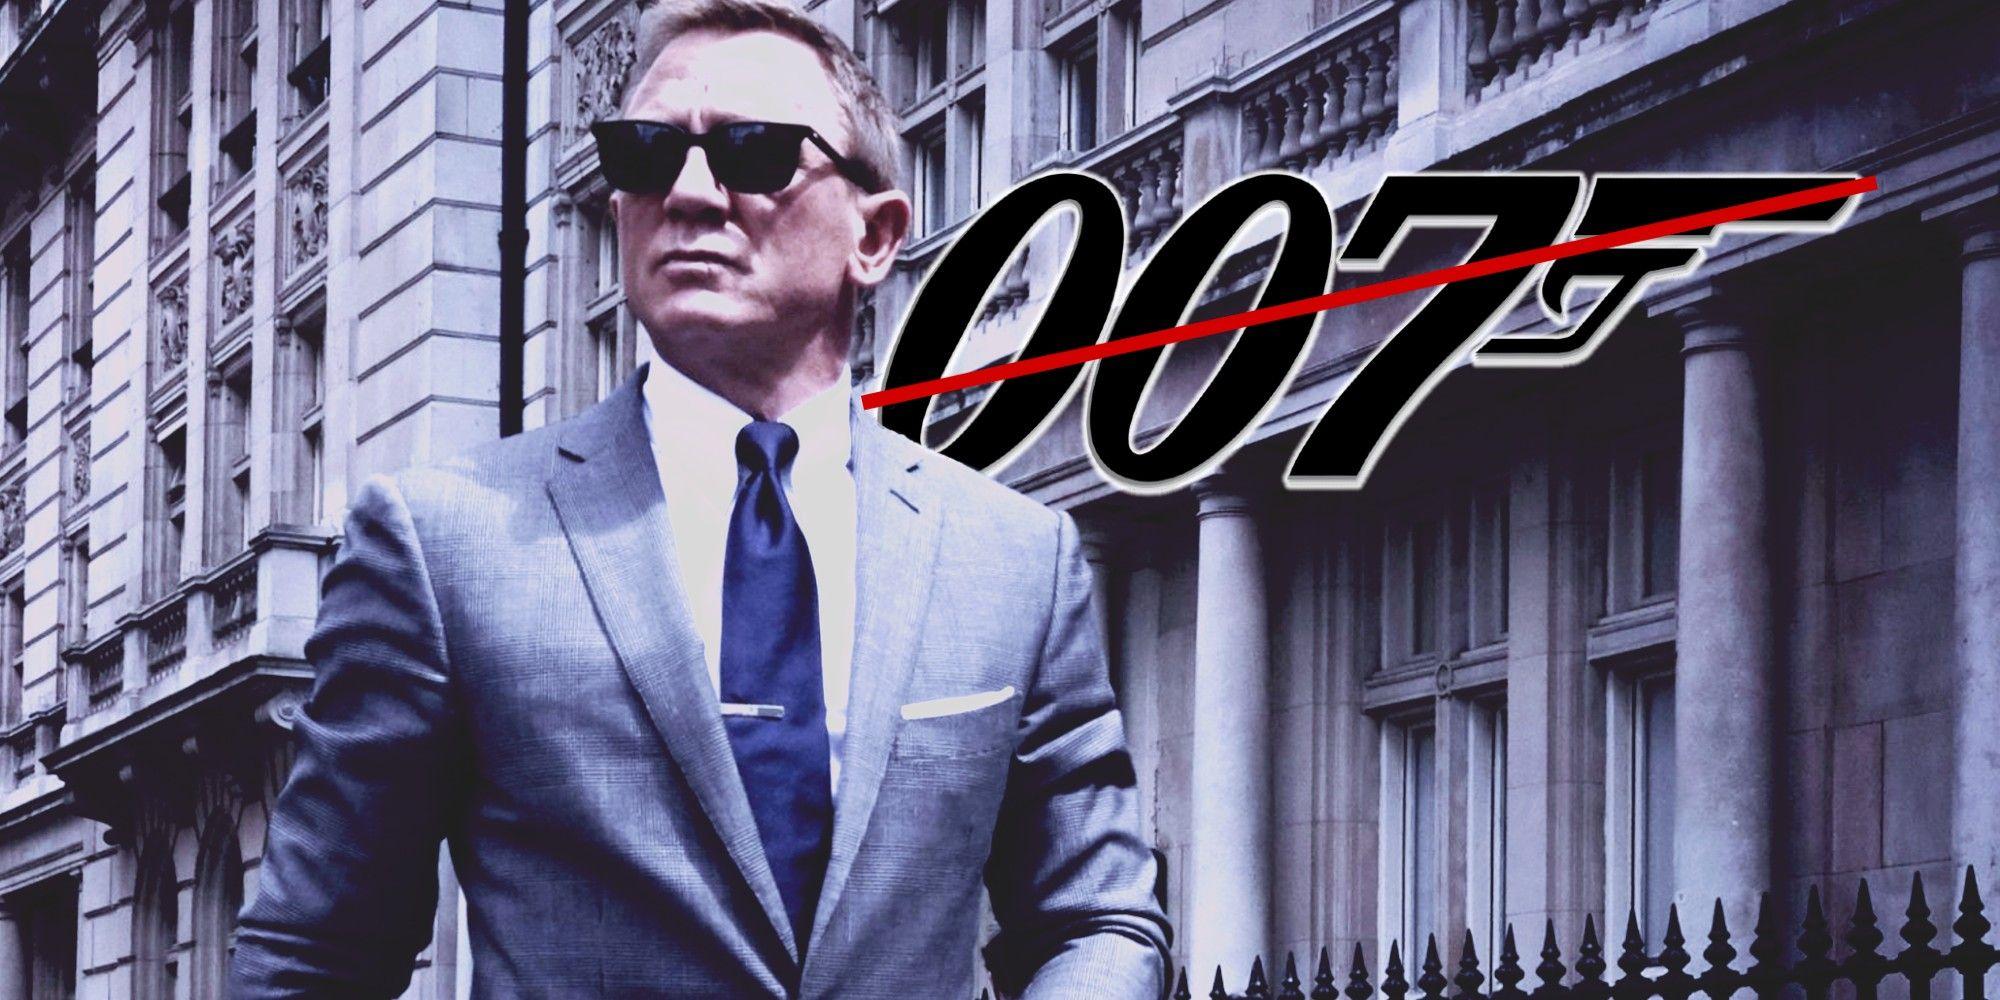 James Bond 007 Spiele